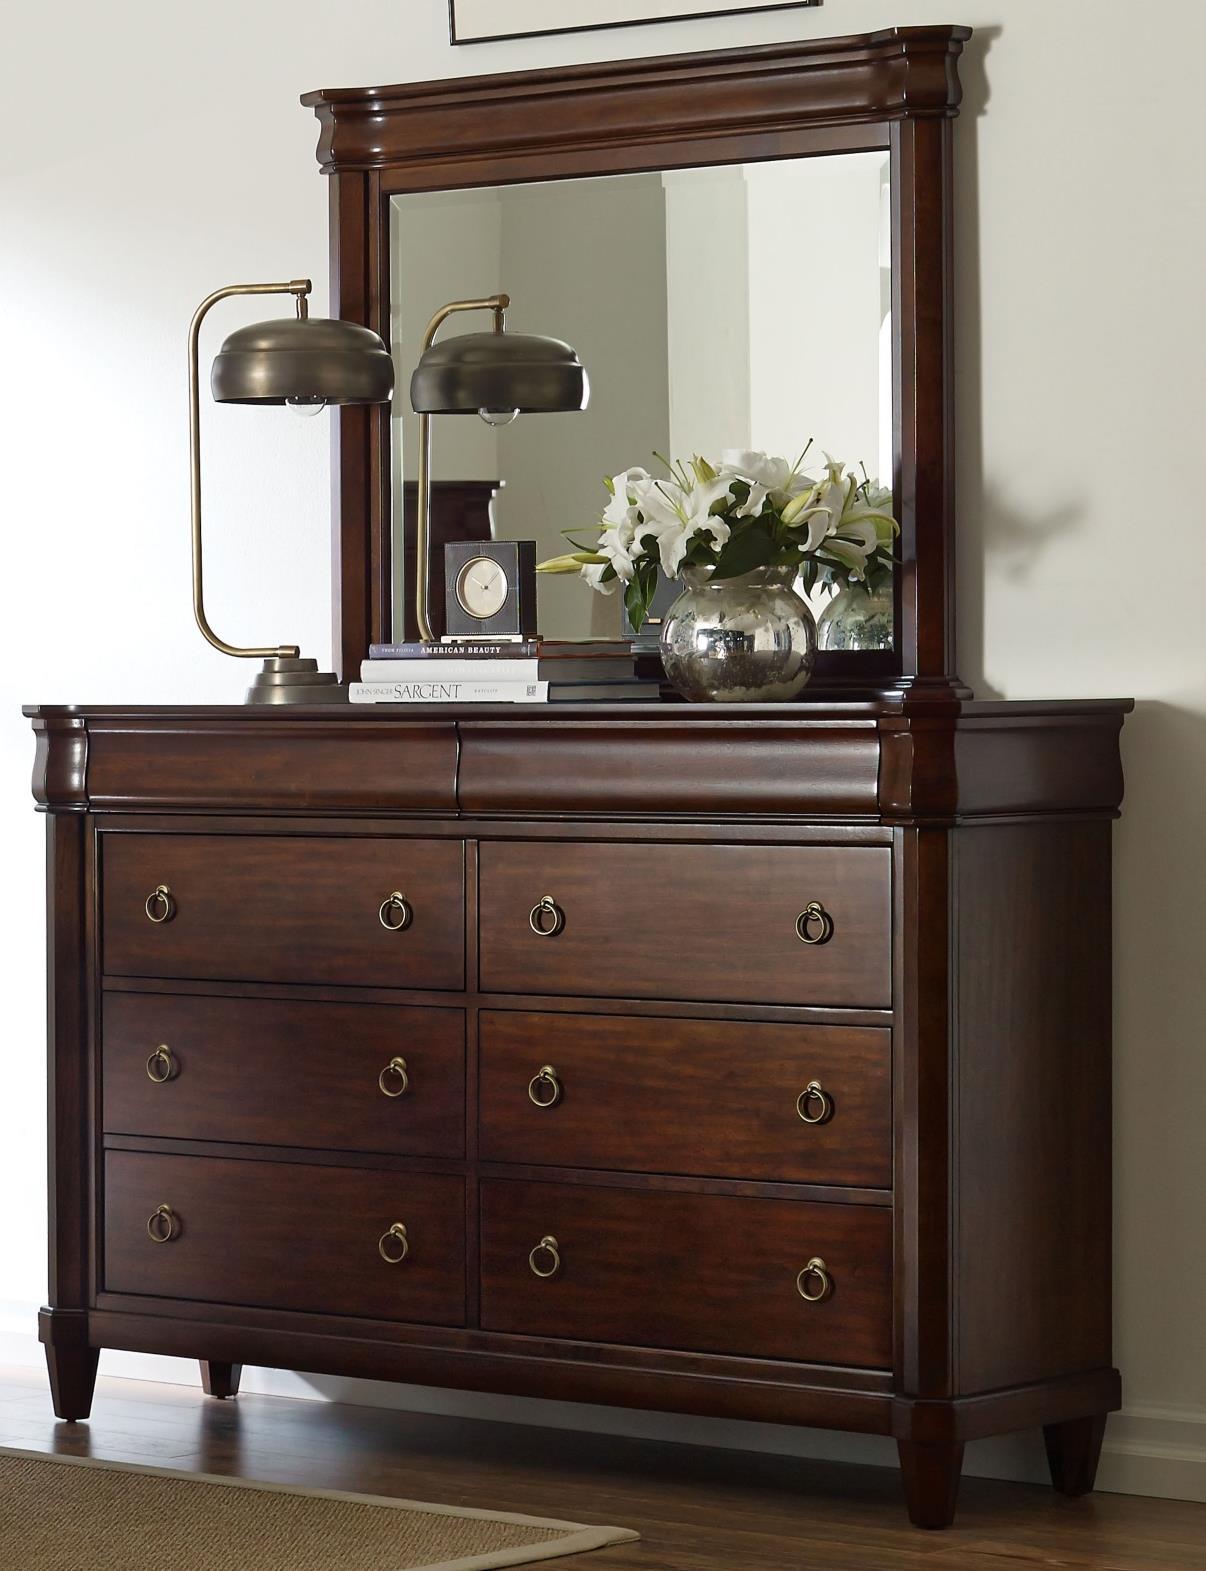 Broyhill Furniture Aryell Dresser + Mirror - Item Number: 4906-230+236